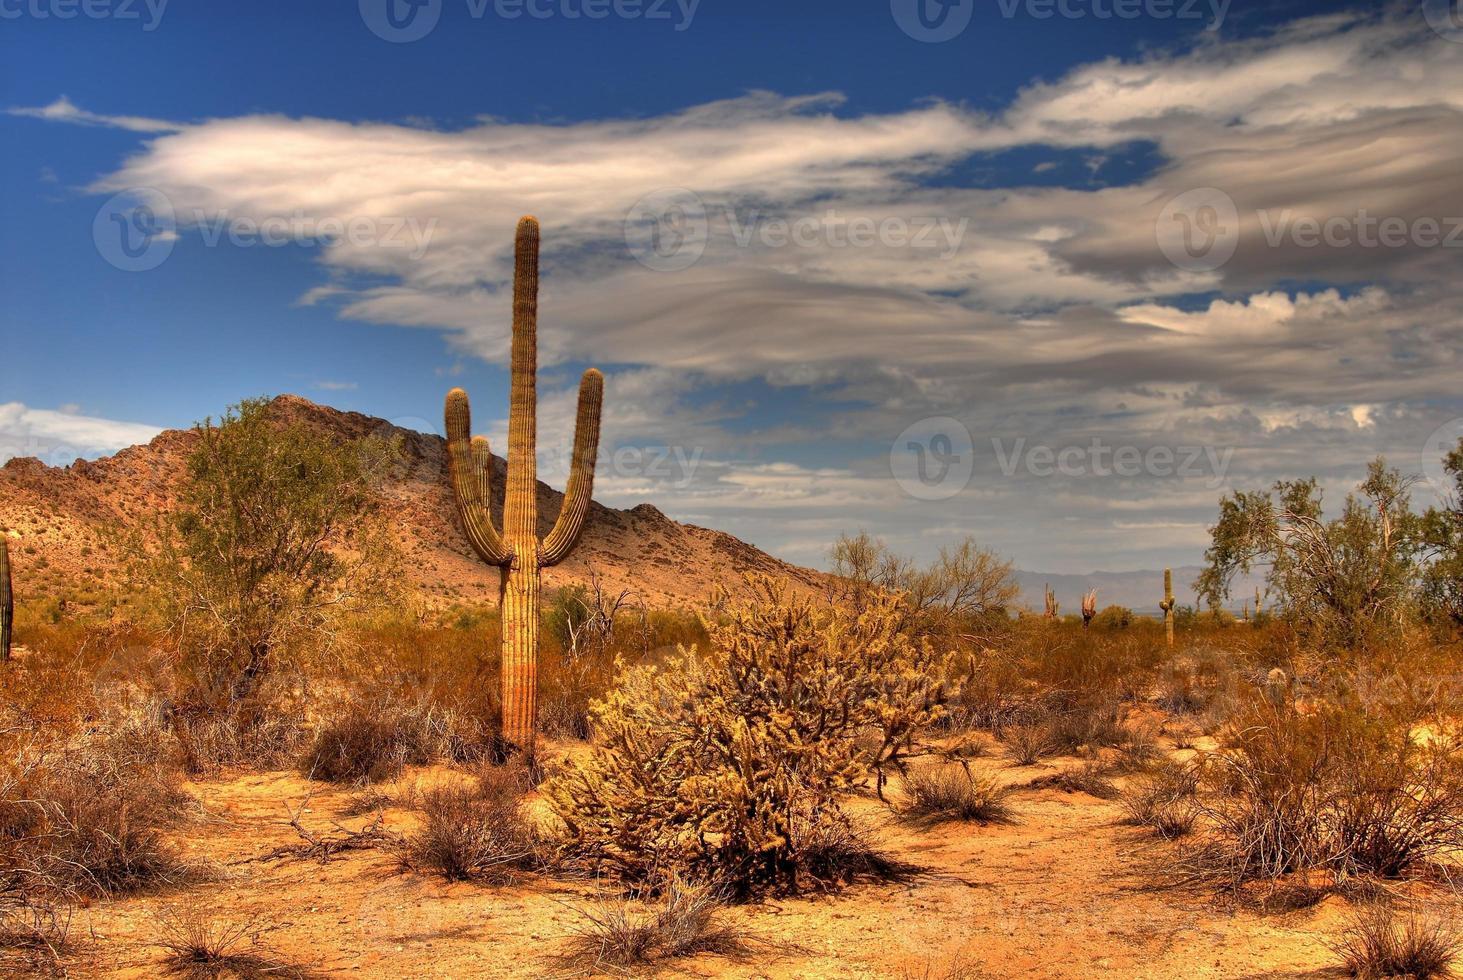 montaña del desierto foto